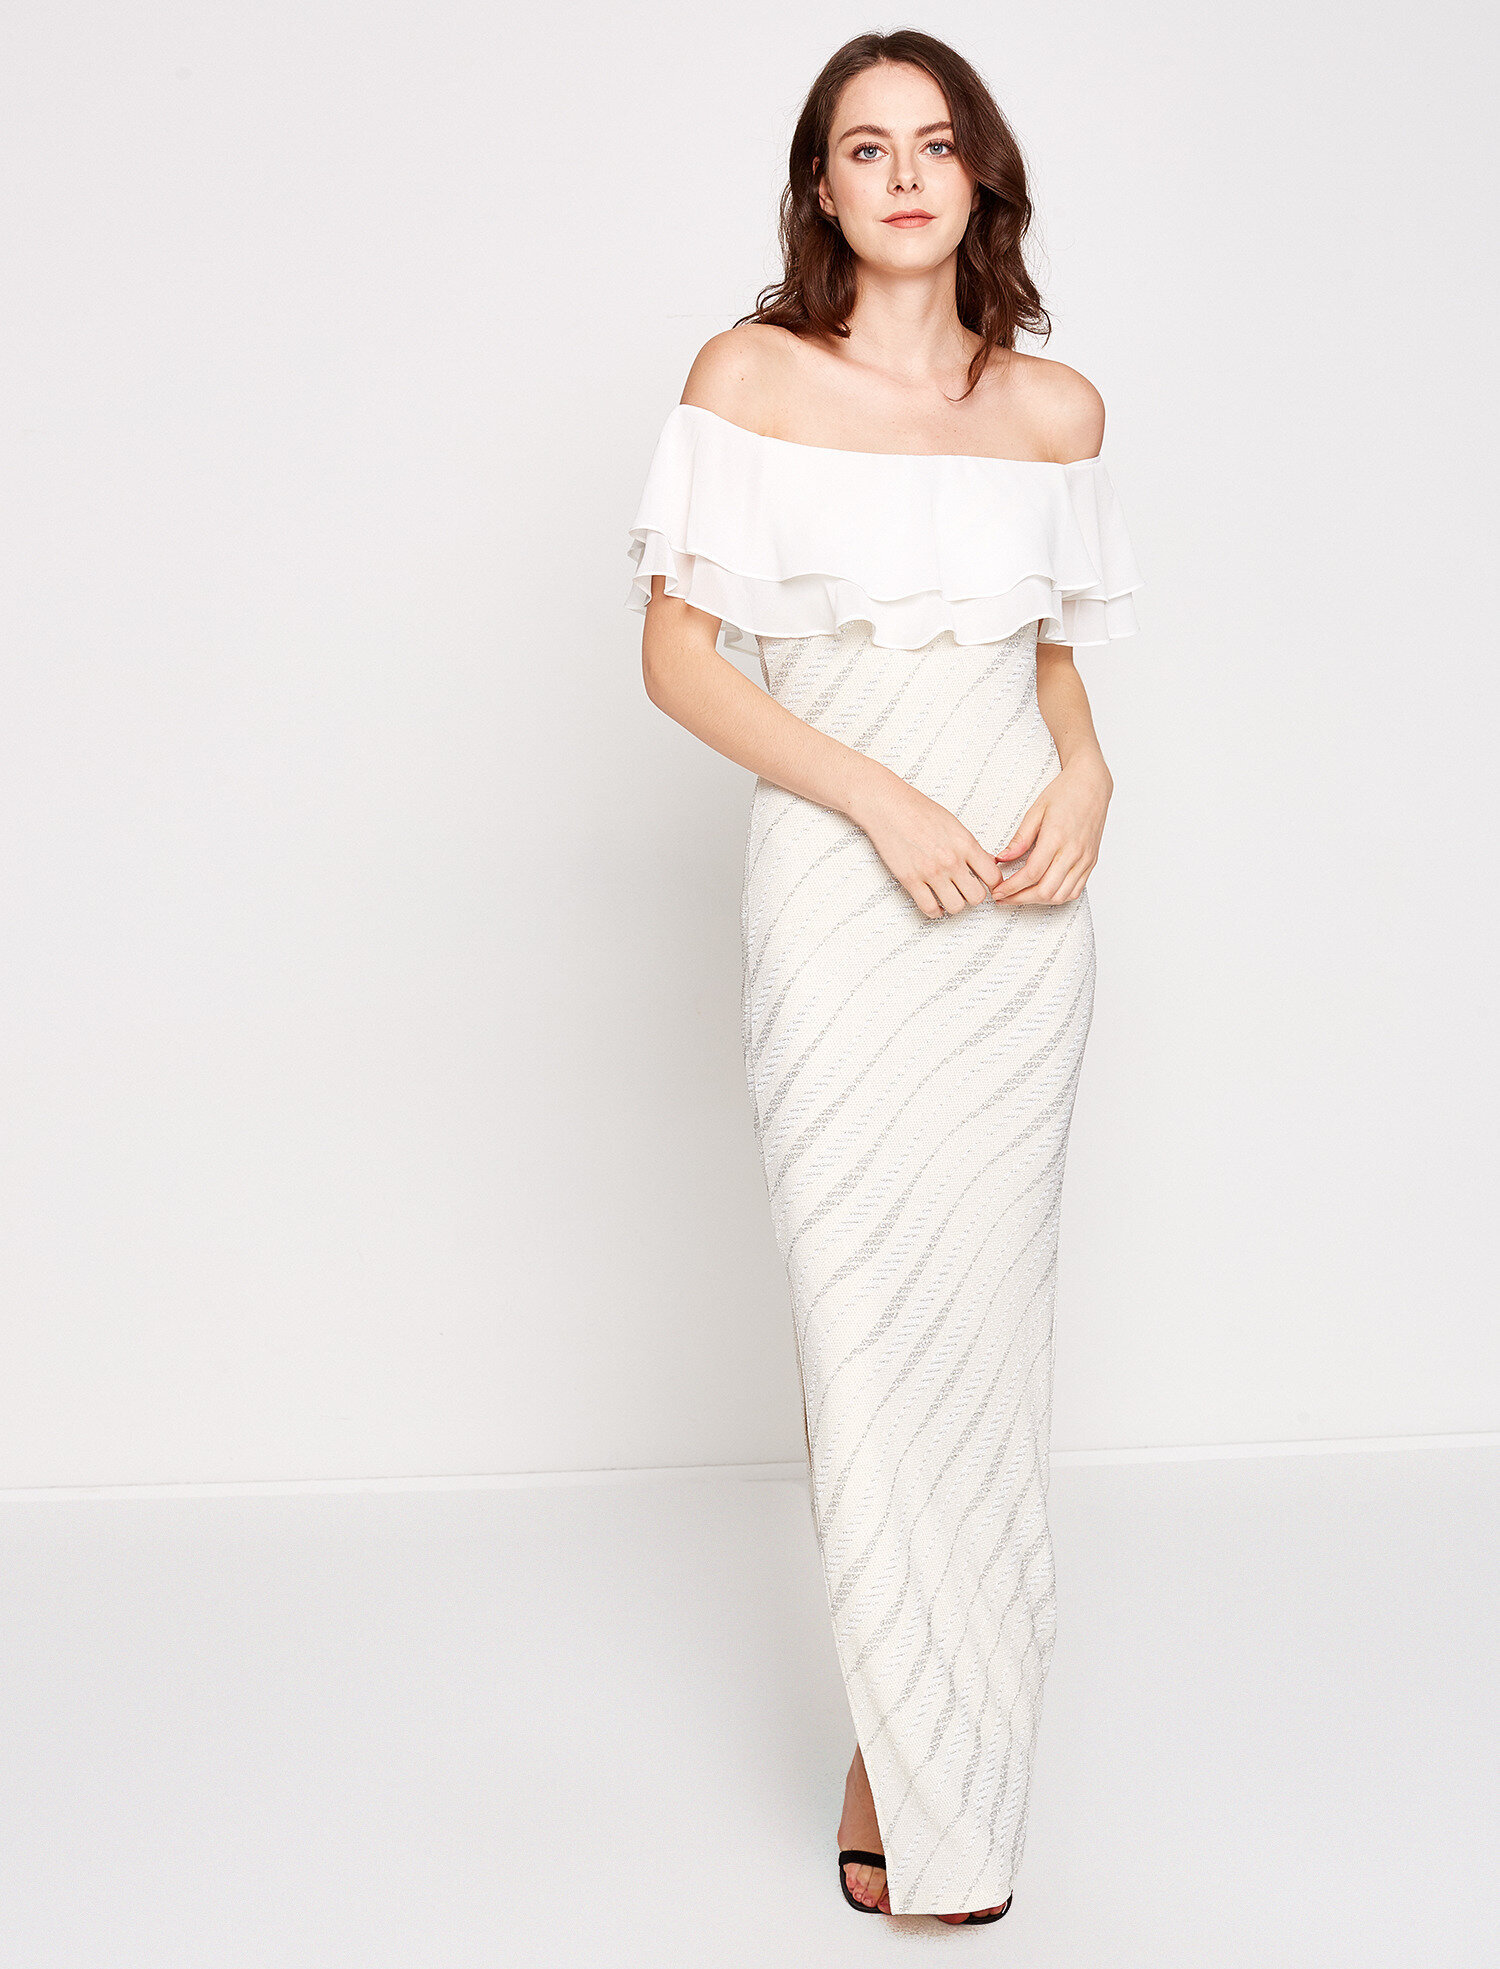 280a897d1c67f Beyaz Bayan Omuz Detaylı Elbise 7YAK84063FK000 | Koton